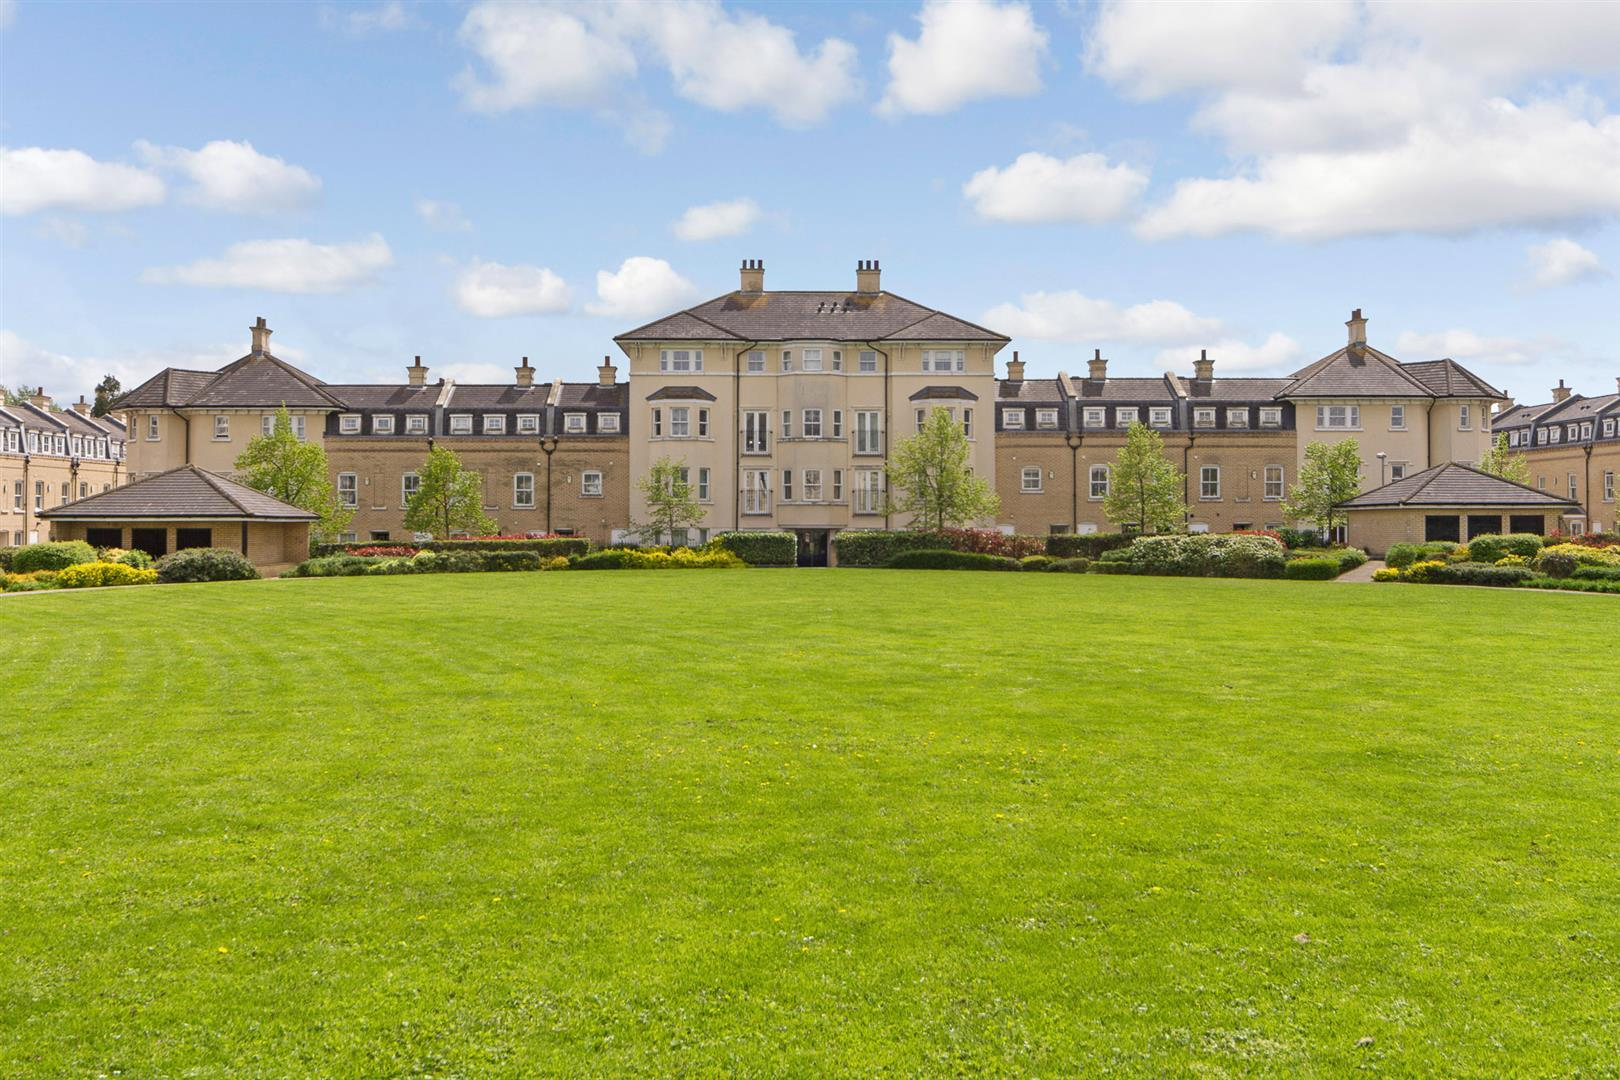 St. Matthews Gardens, Cambridge